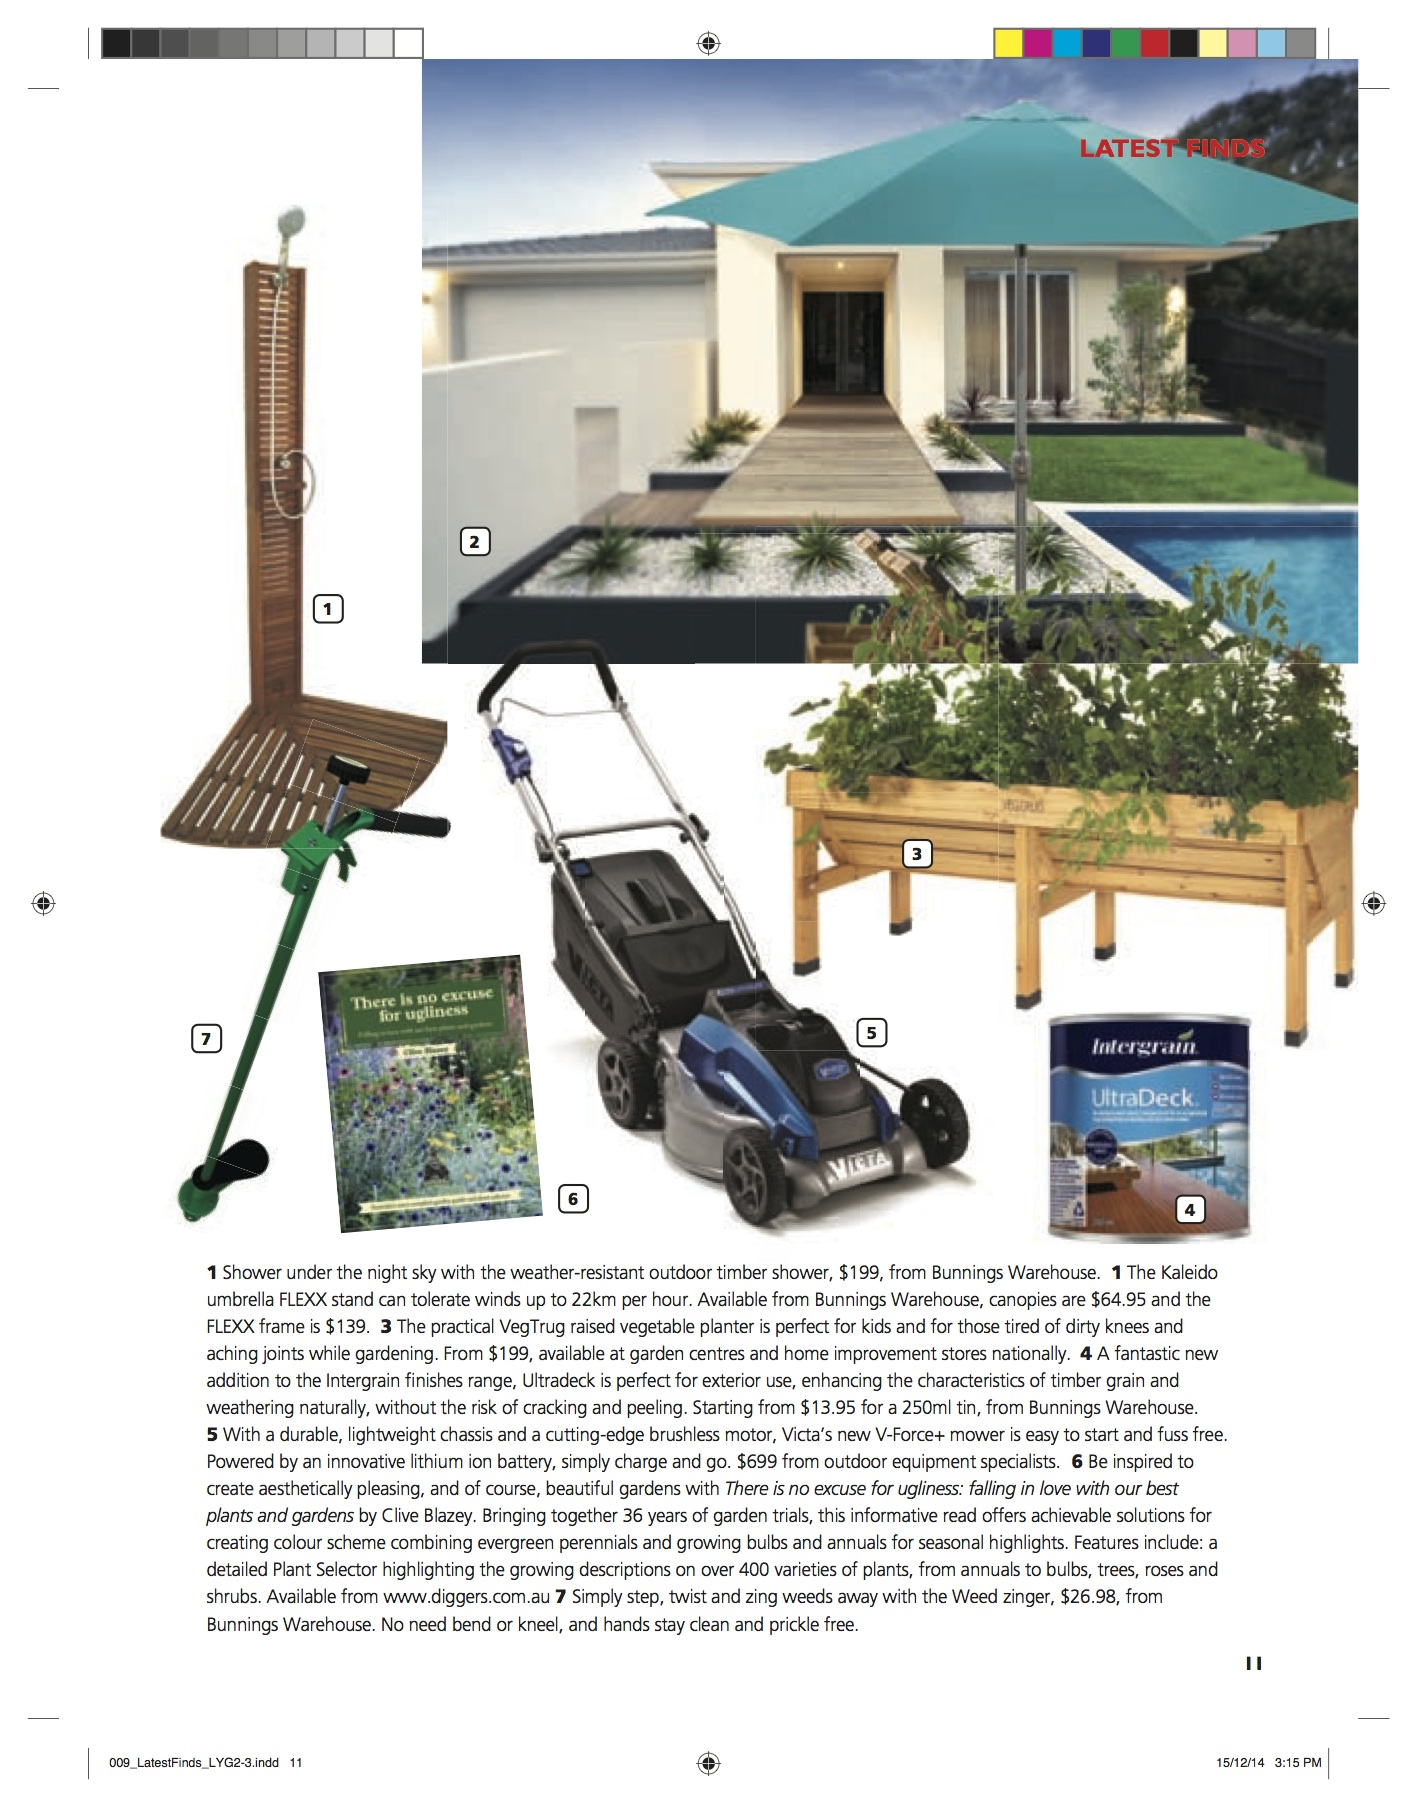 011-landscaping-your-garden-2-3-lr-copy.jpg